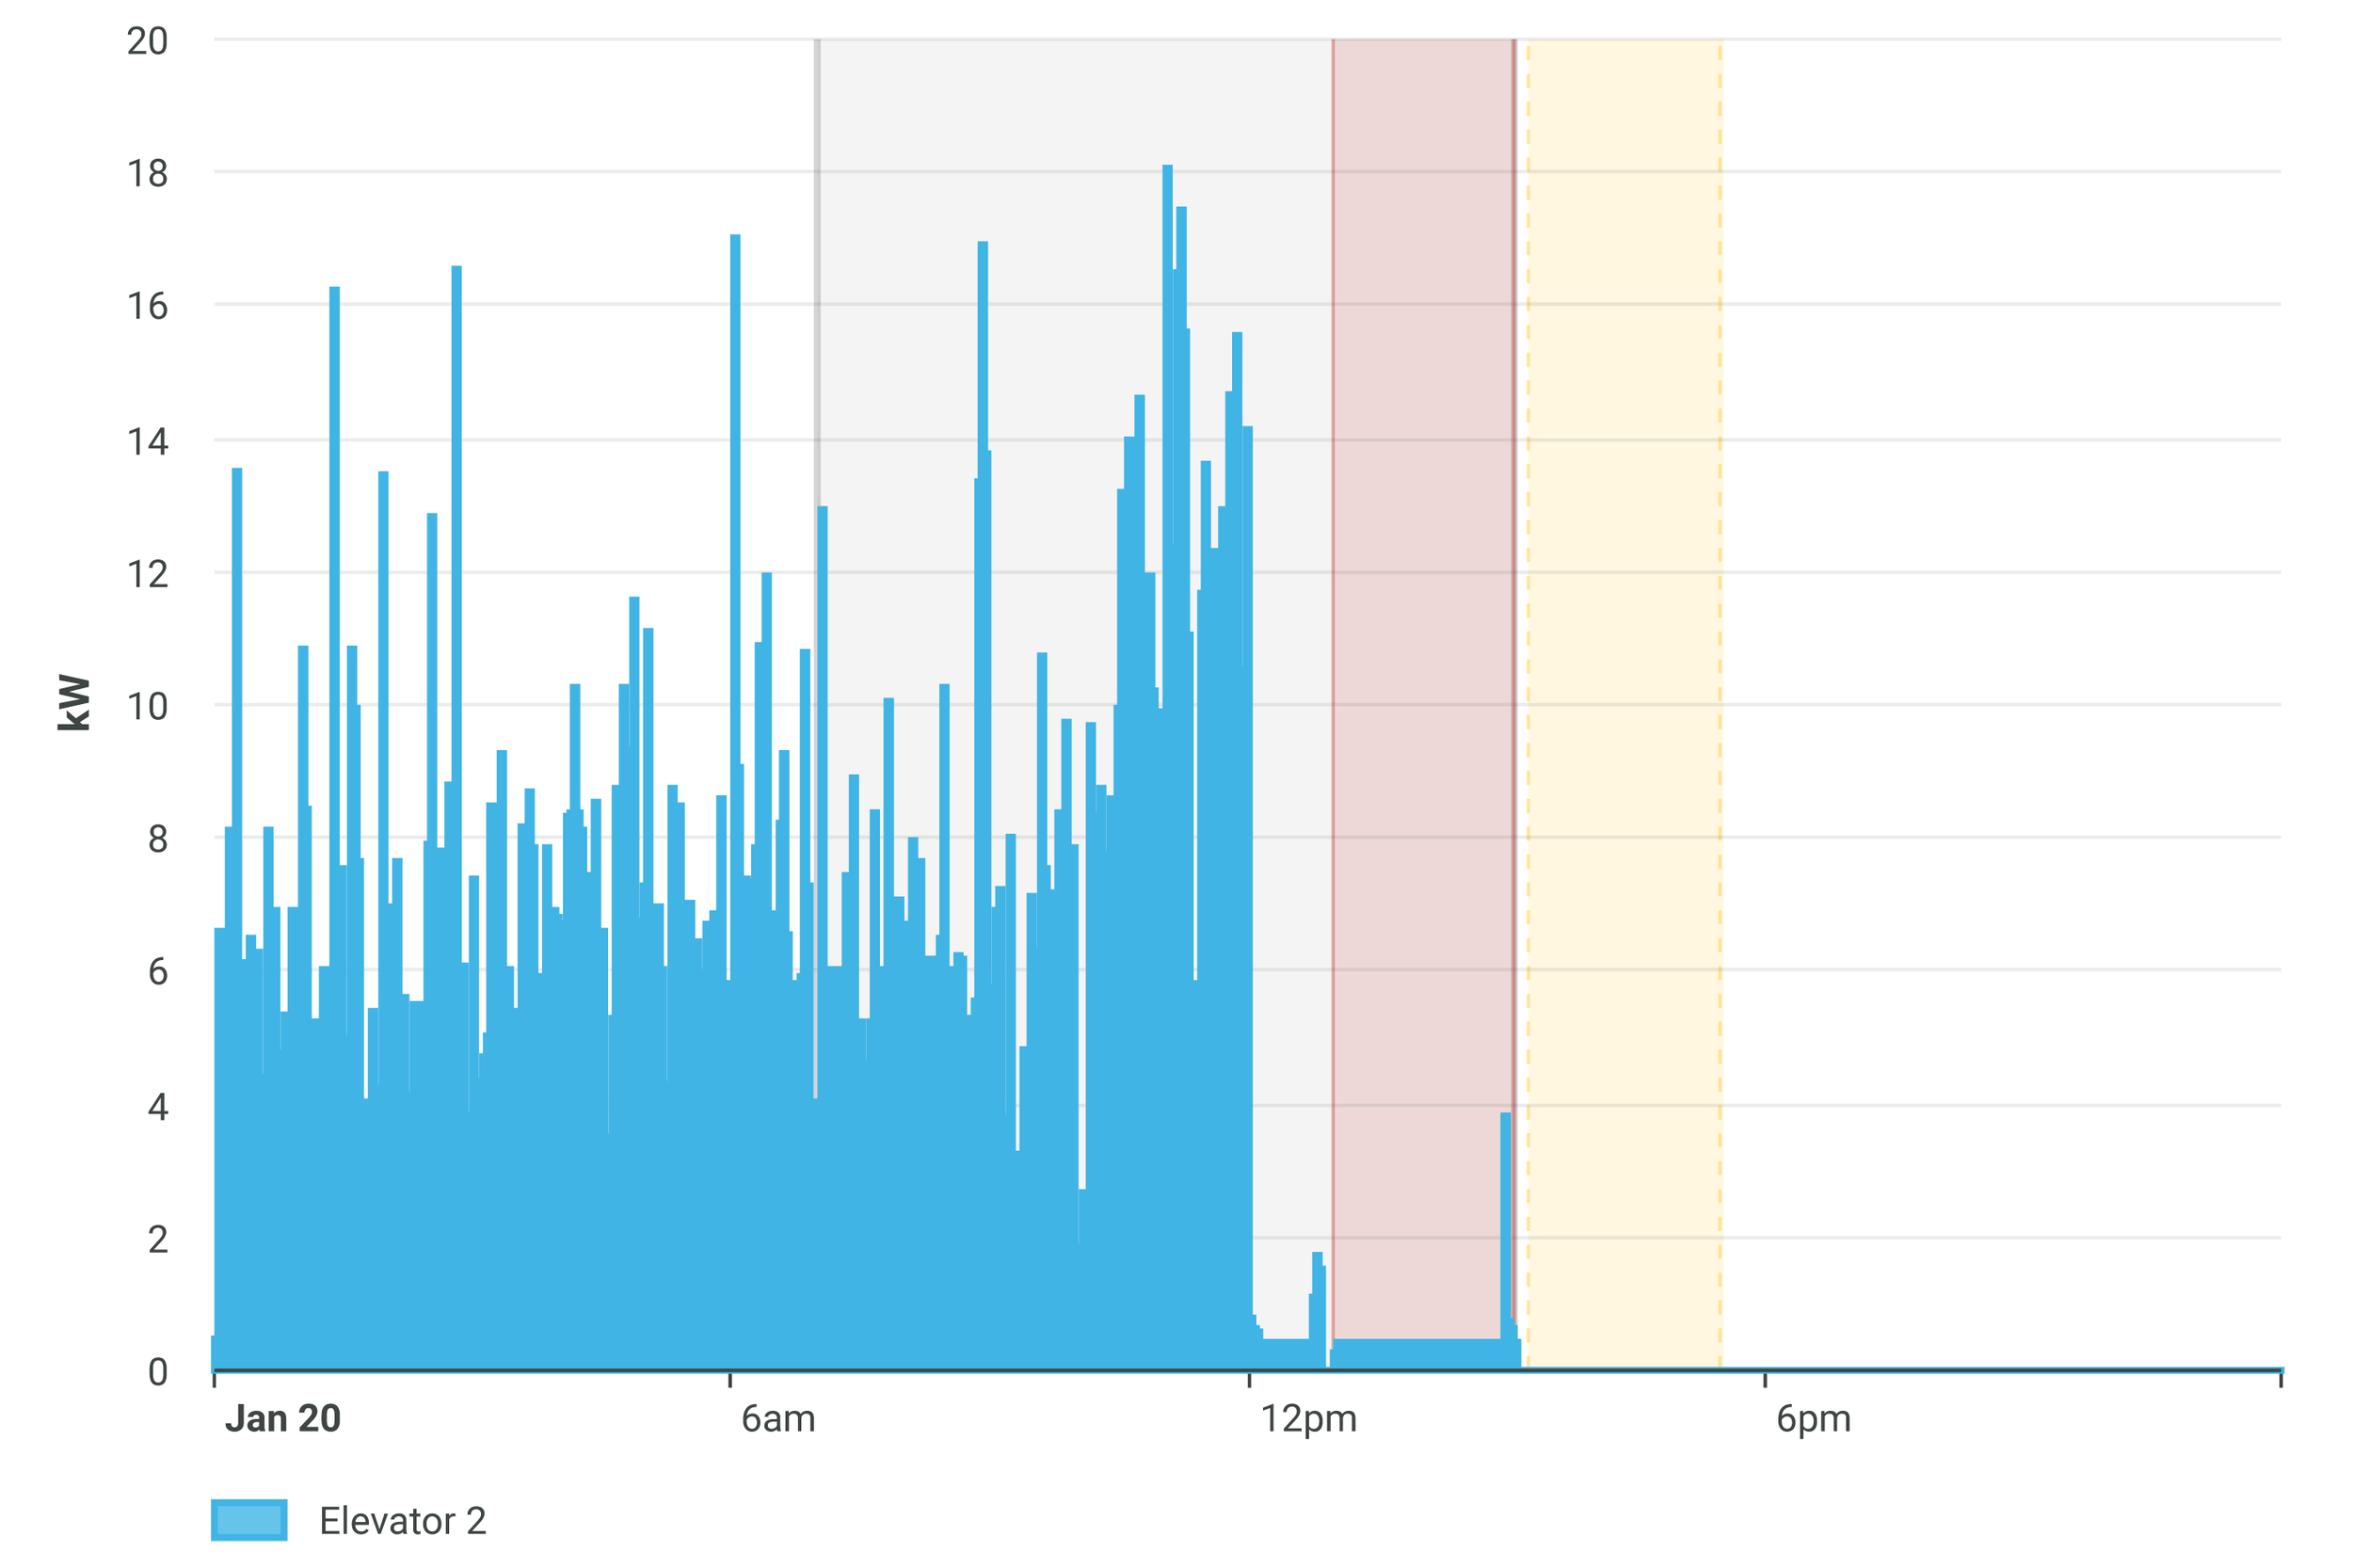 Light grey highlight: Beginning of reported repair hours  Dark red highlight: Data monitored beginning of idling  Yellow highlight: Equipment shutdown